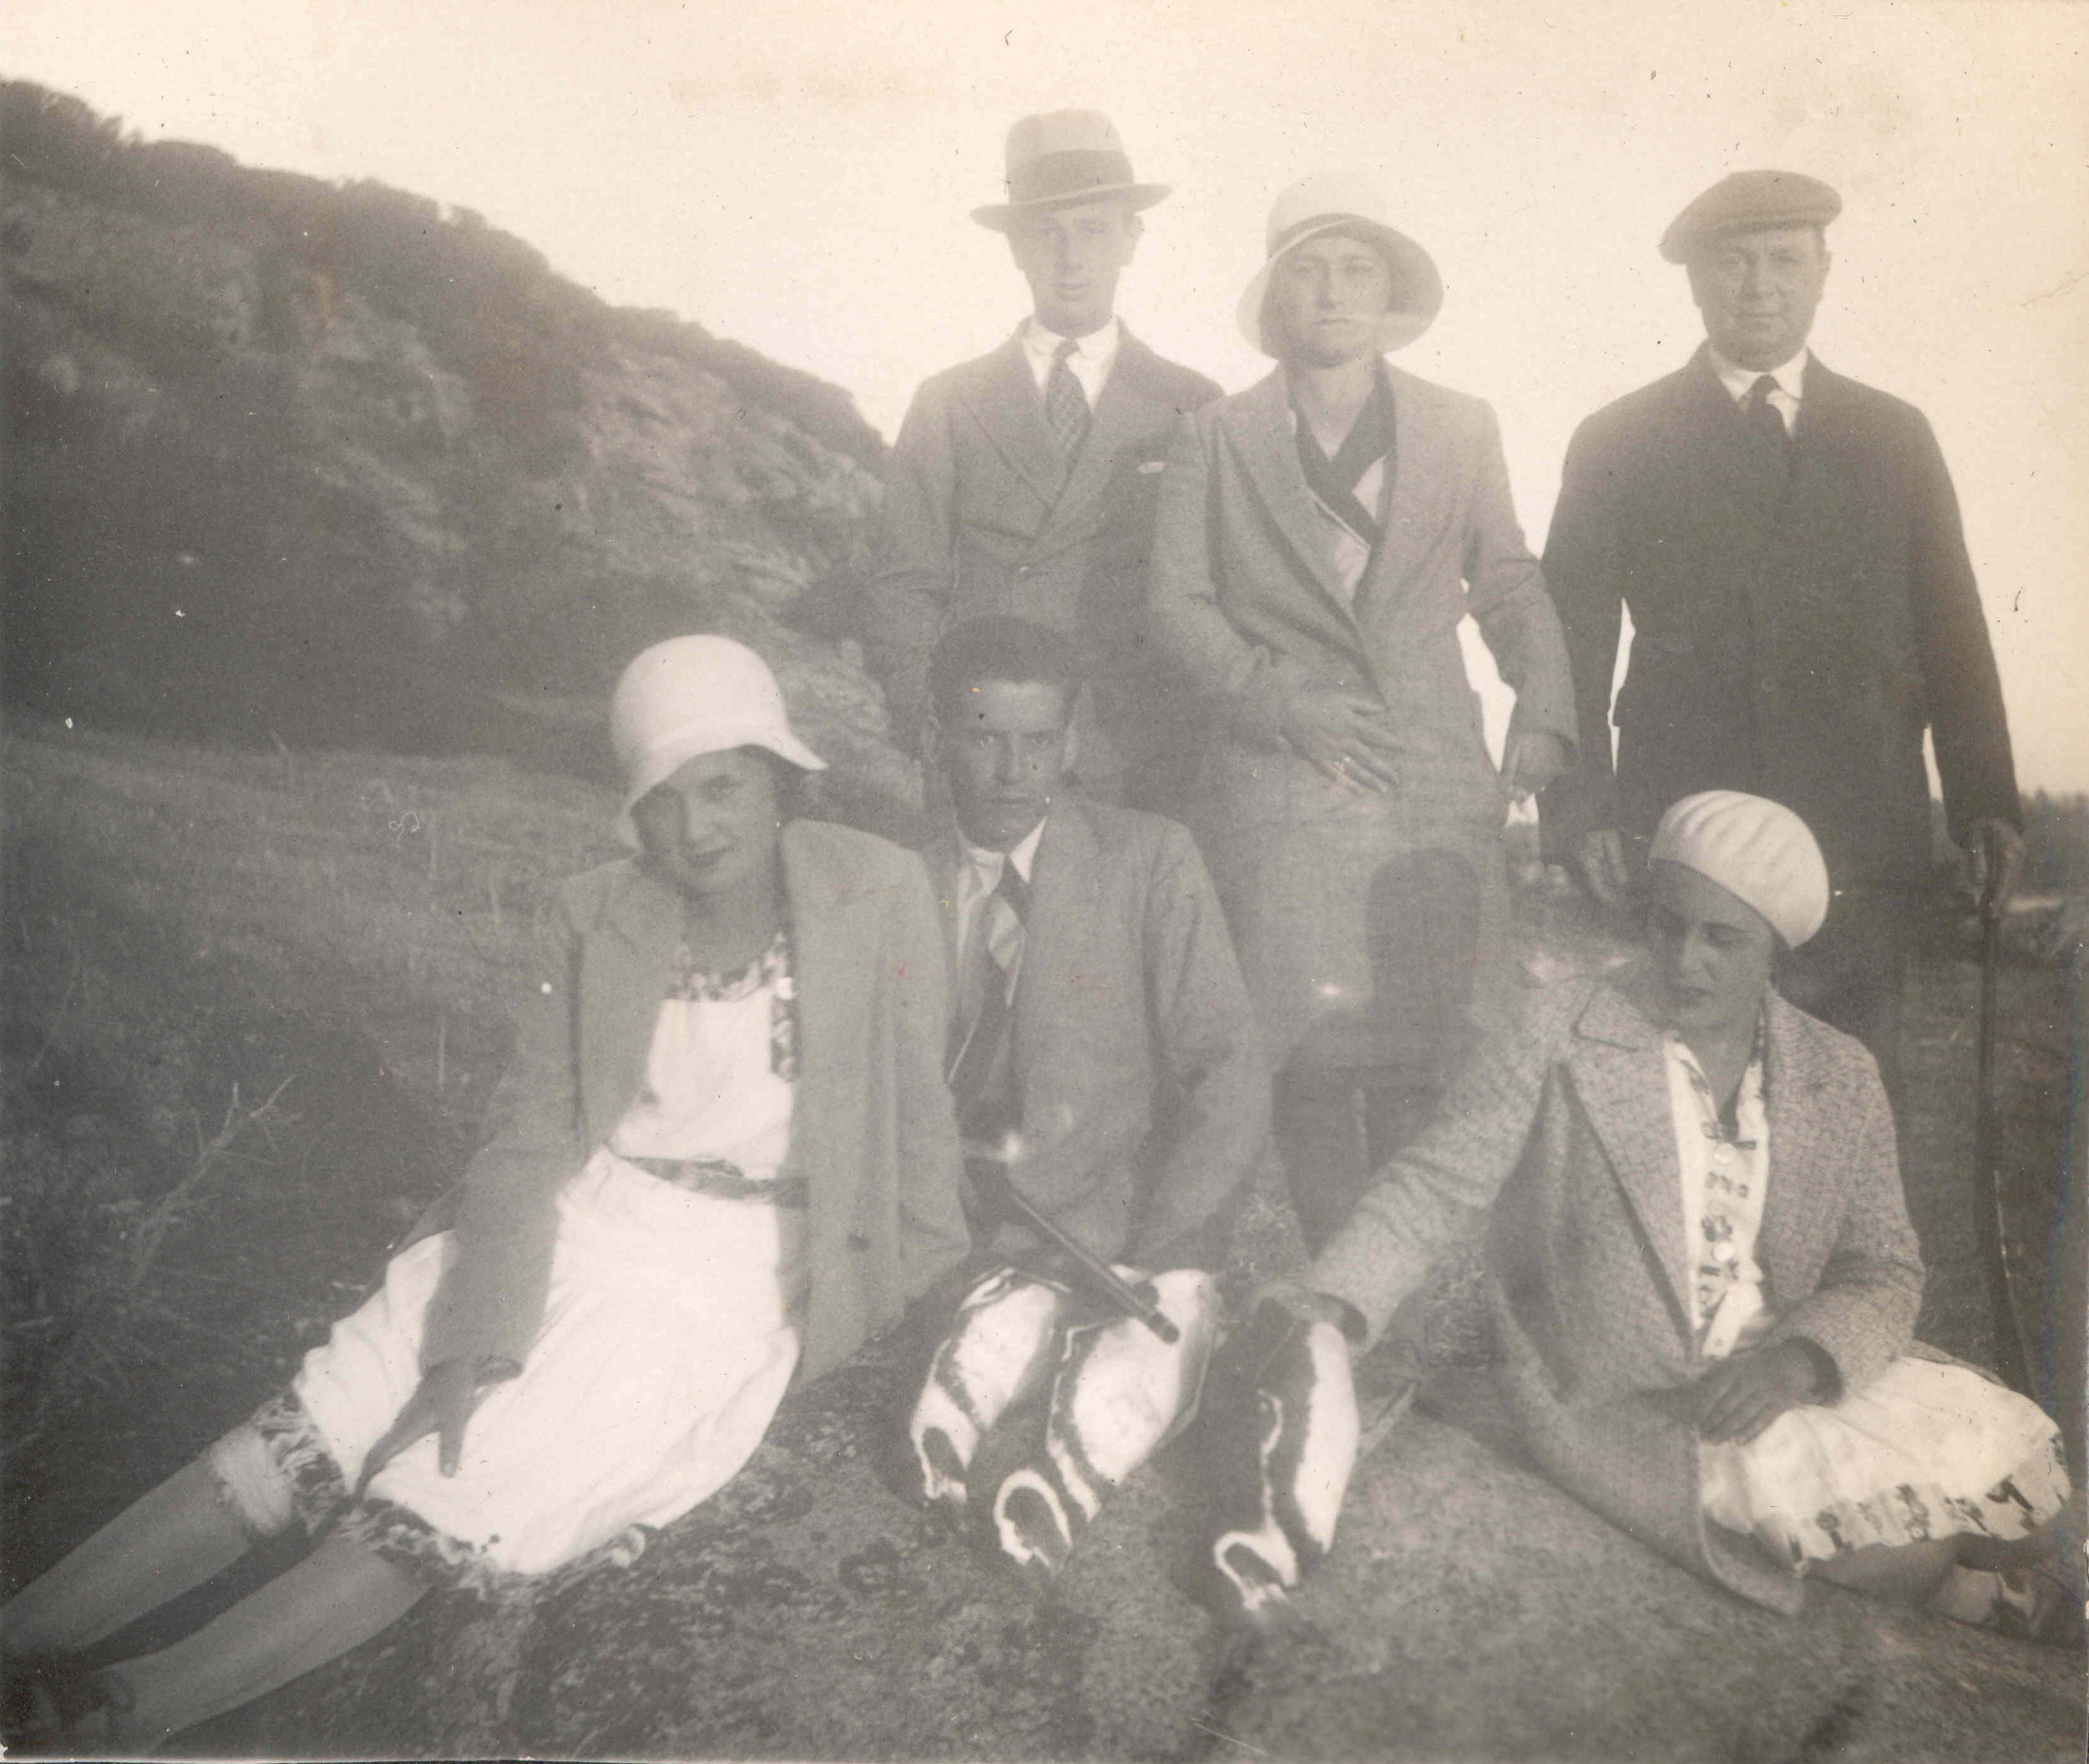 Enterreno - Fotos históricas de chile - fotos antiguas de Chile - Algarrobo 1930